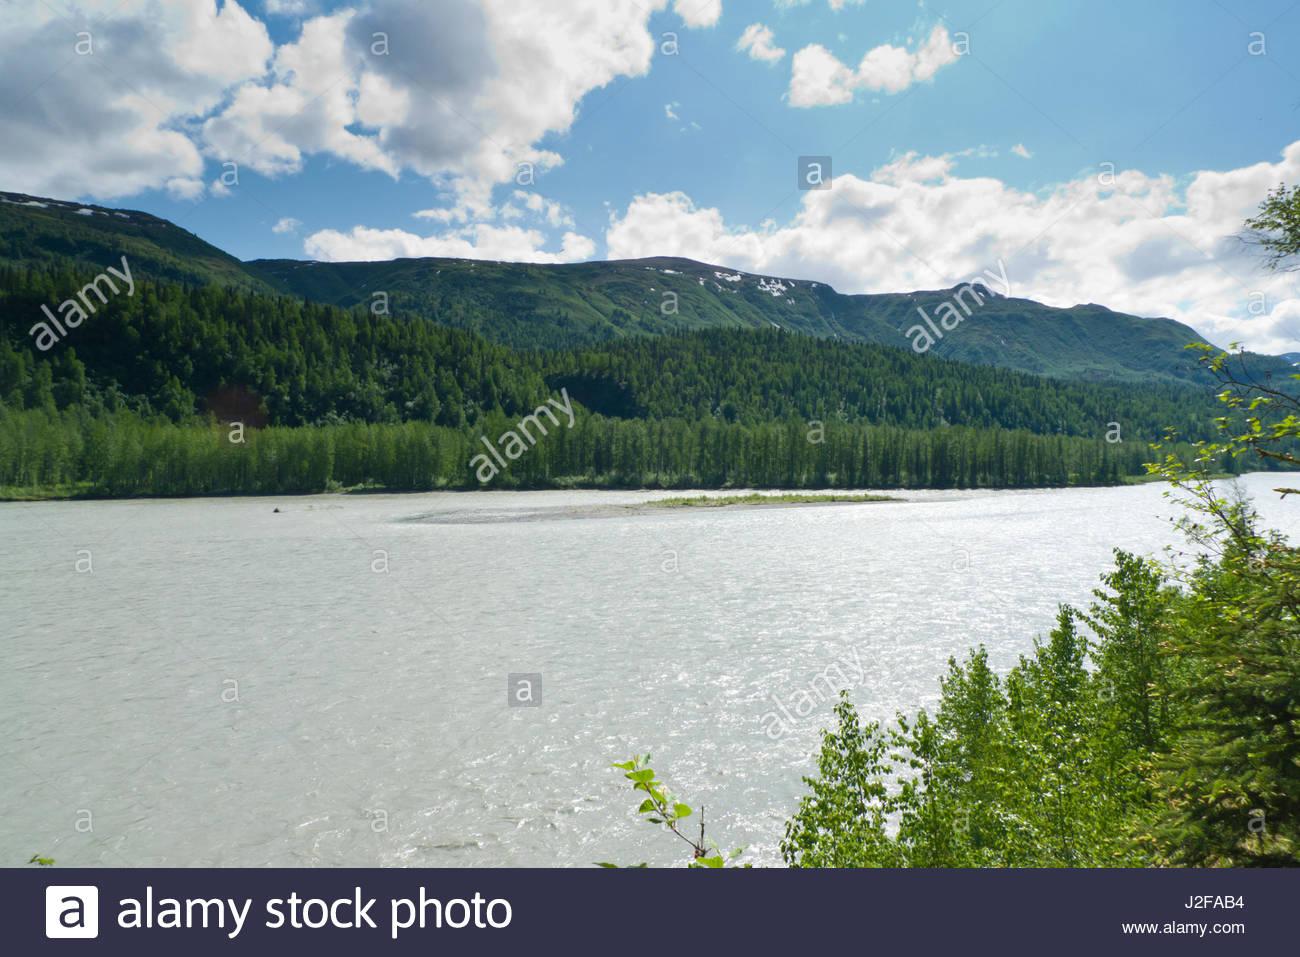 Alaska matanuska susitna county talkeetna - Stock Photo Susitna River Talkeetna Mountains Matanuska Susitna Borough Alaska Usa